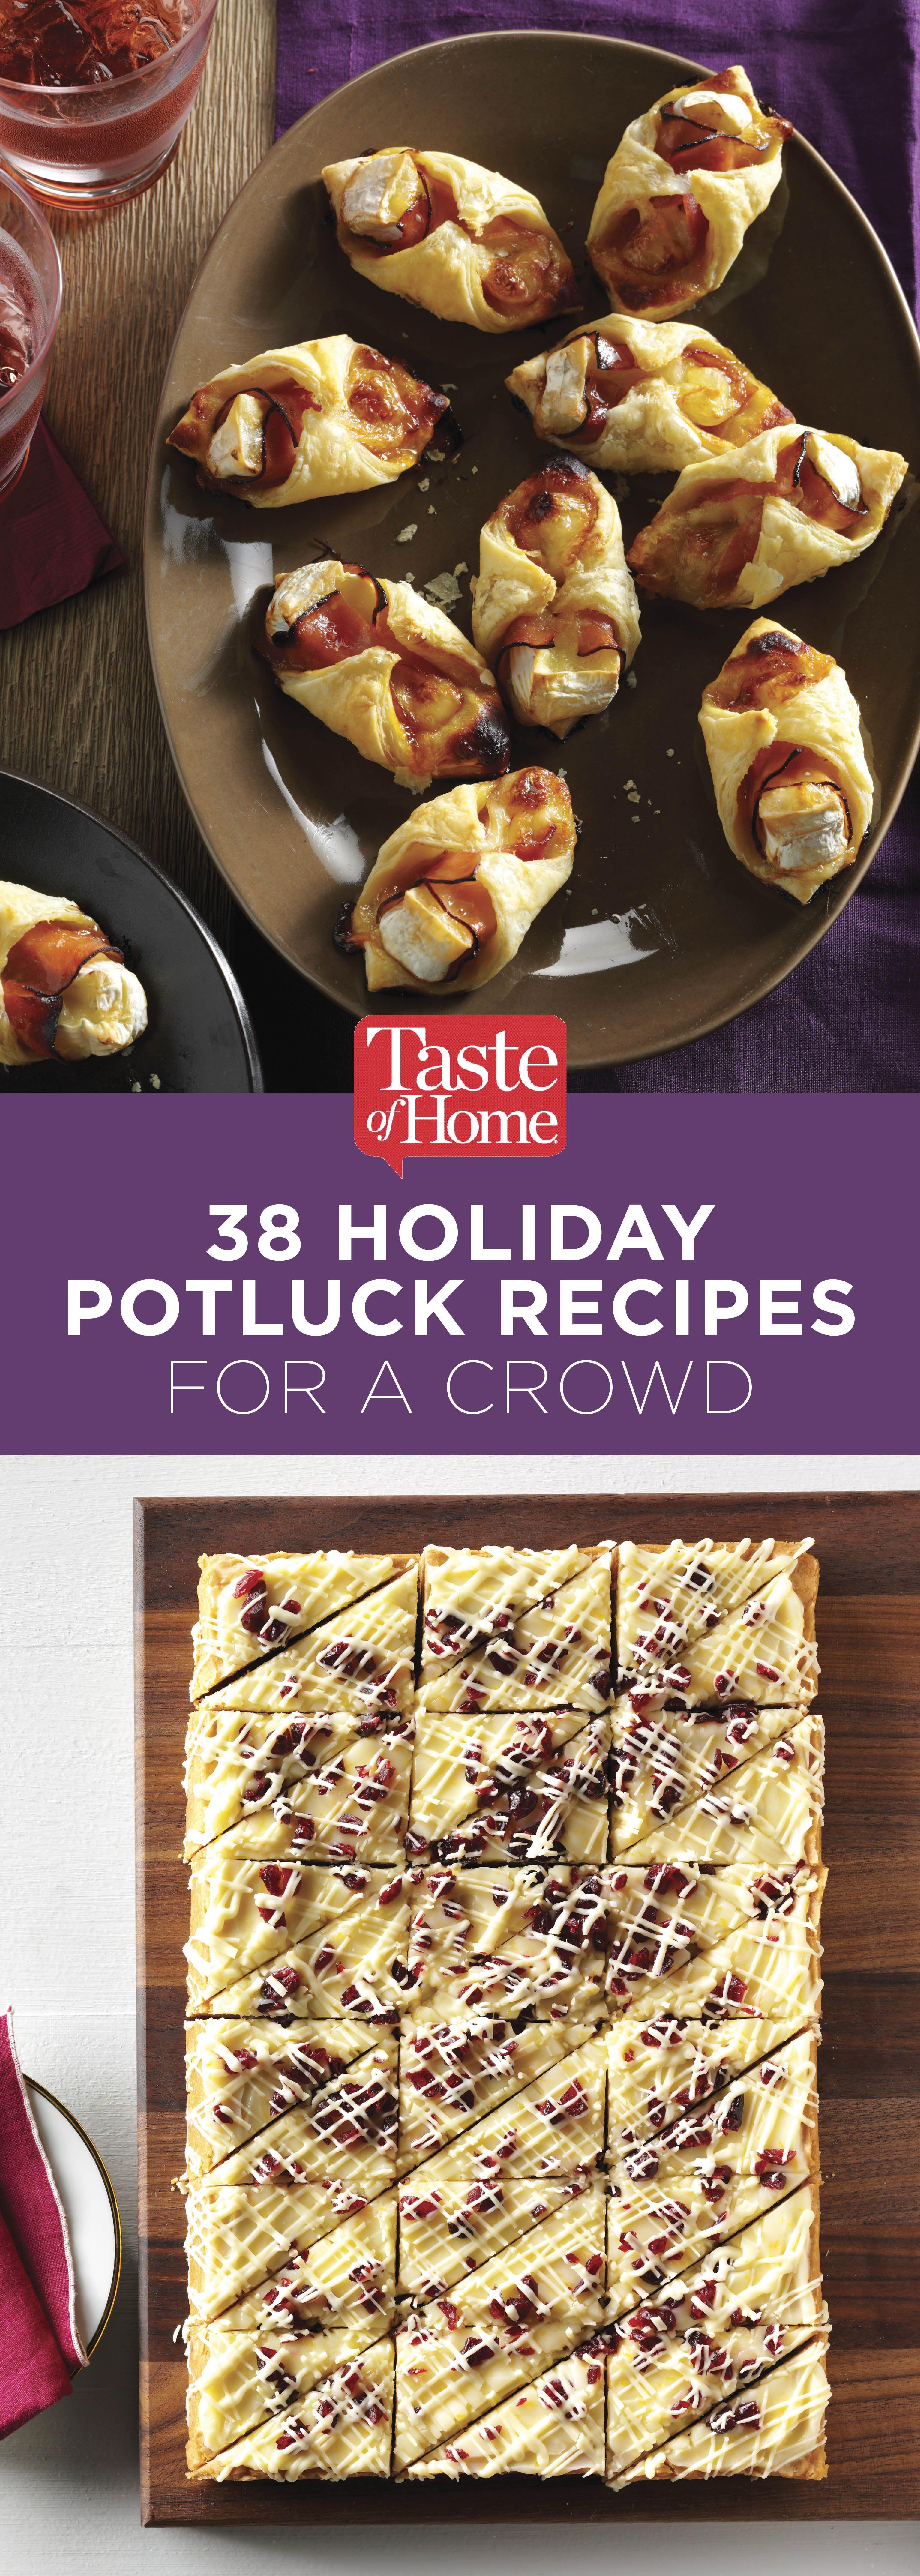 45 Holiday Potluck Recipes for a Crowd #potluckrecipes